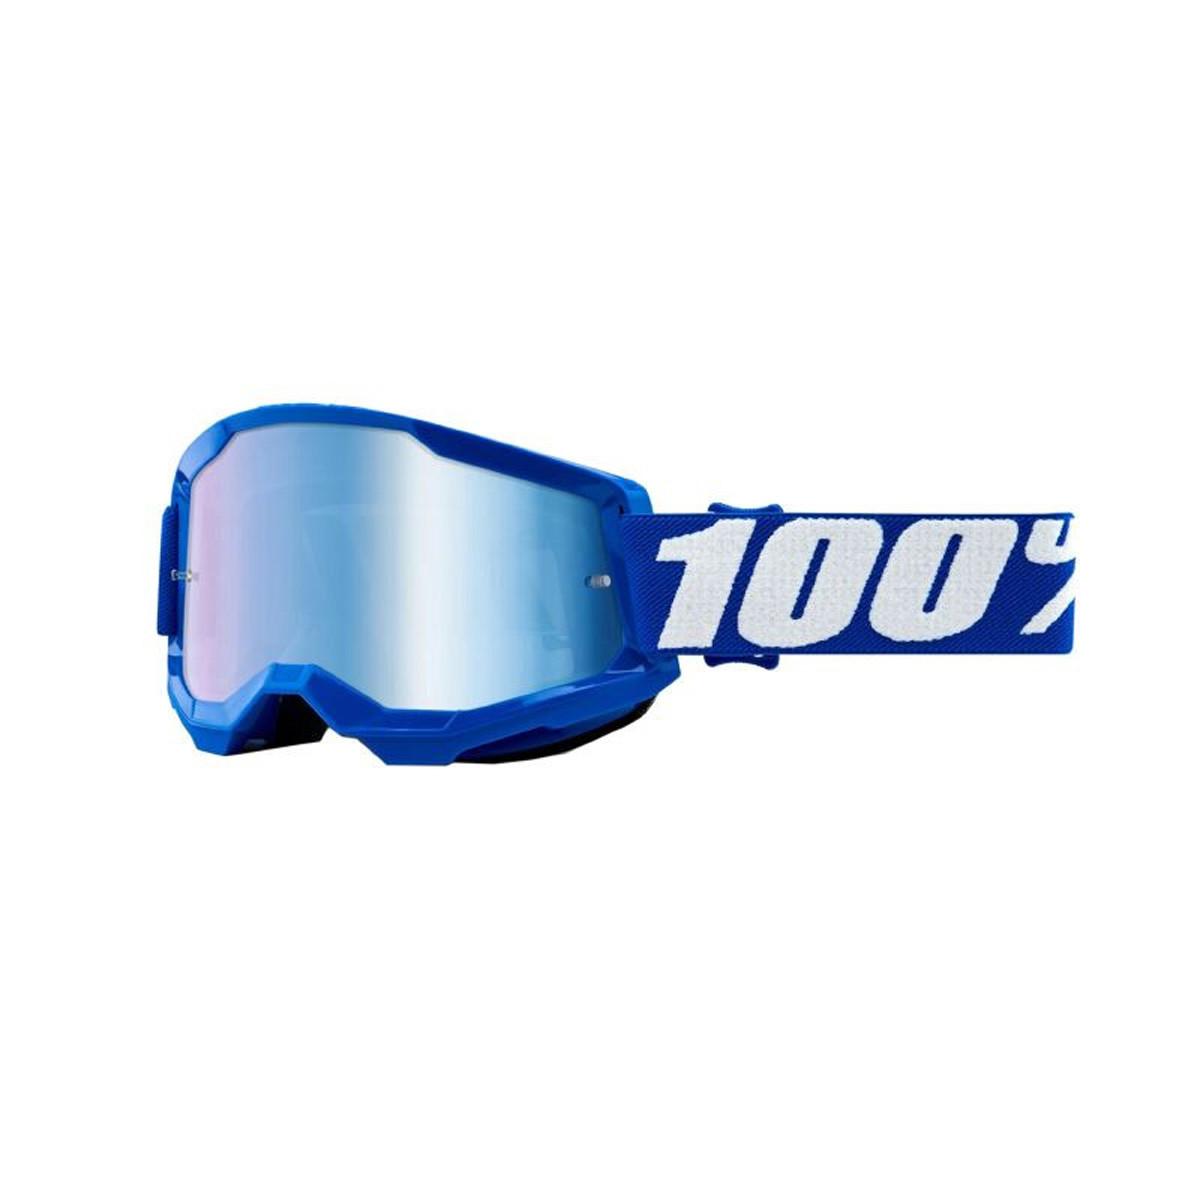 Masque / Lunettes Cross - 100% Strata 2 Essential Bleu Ecran Transparent